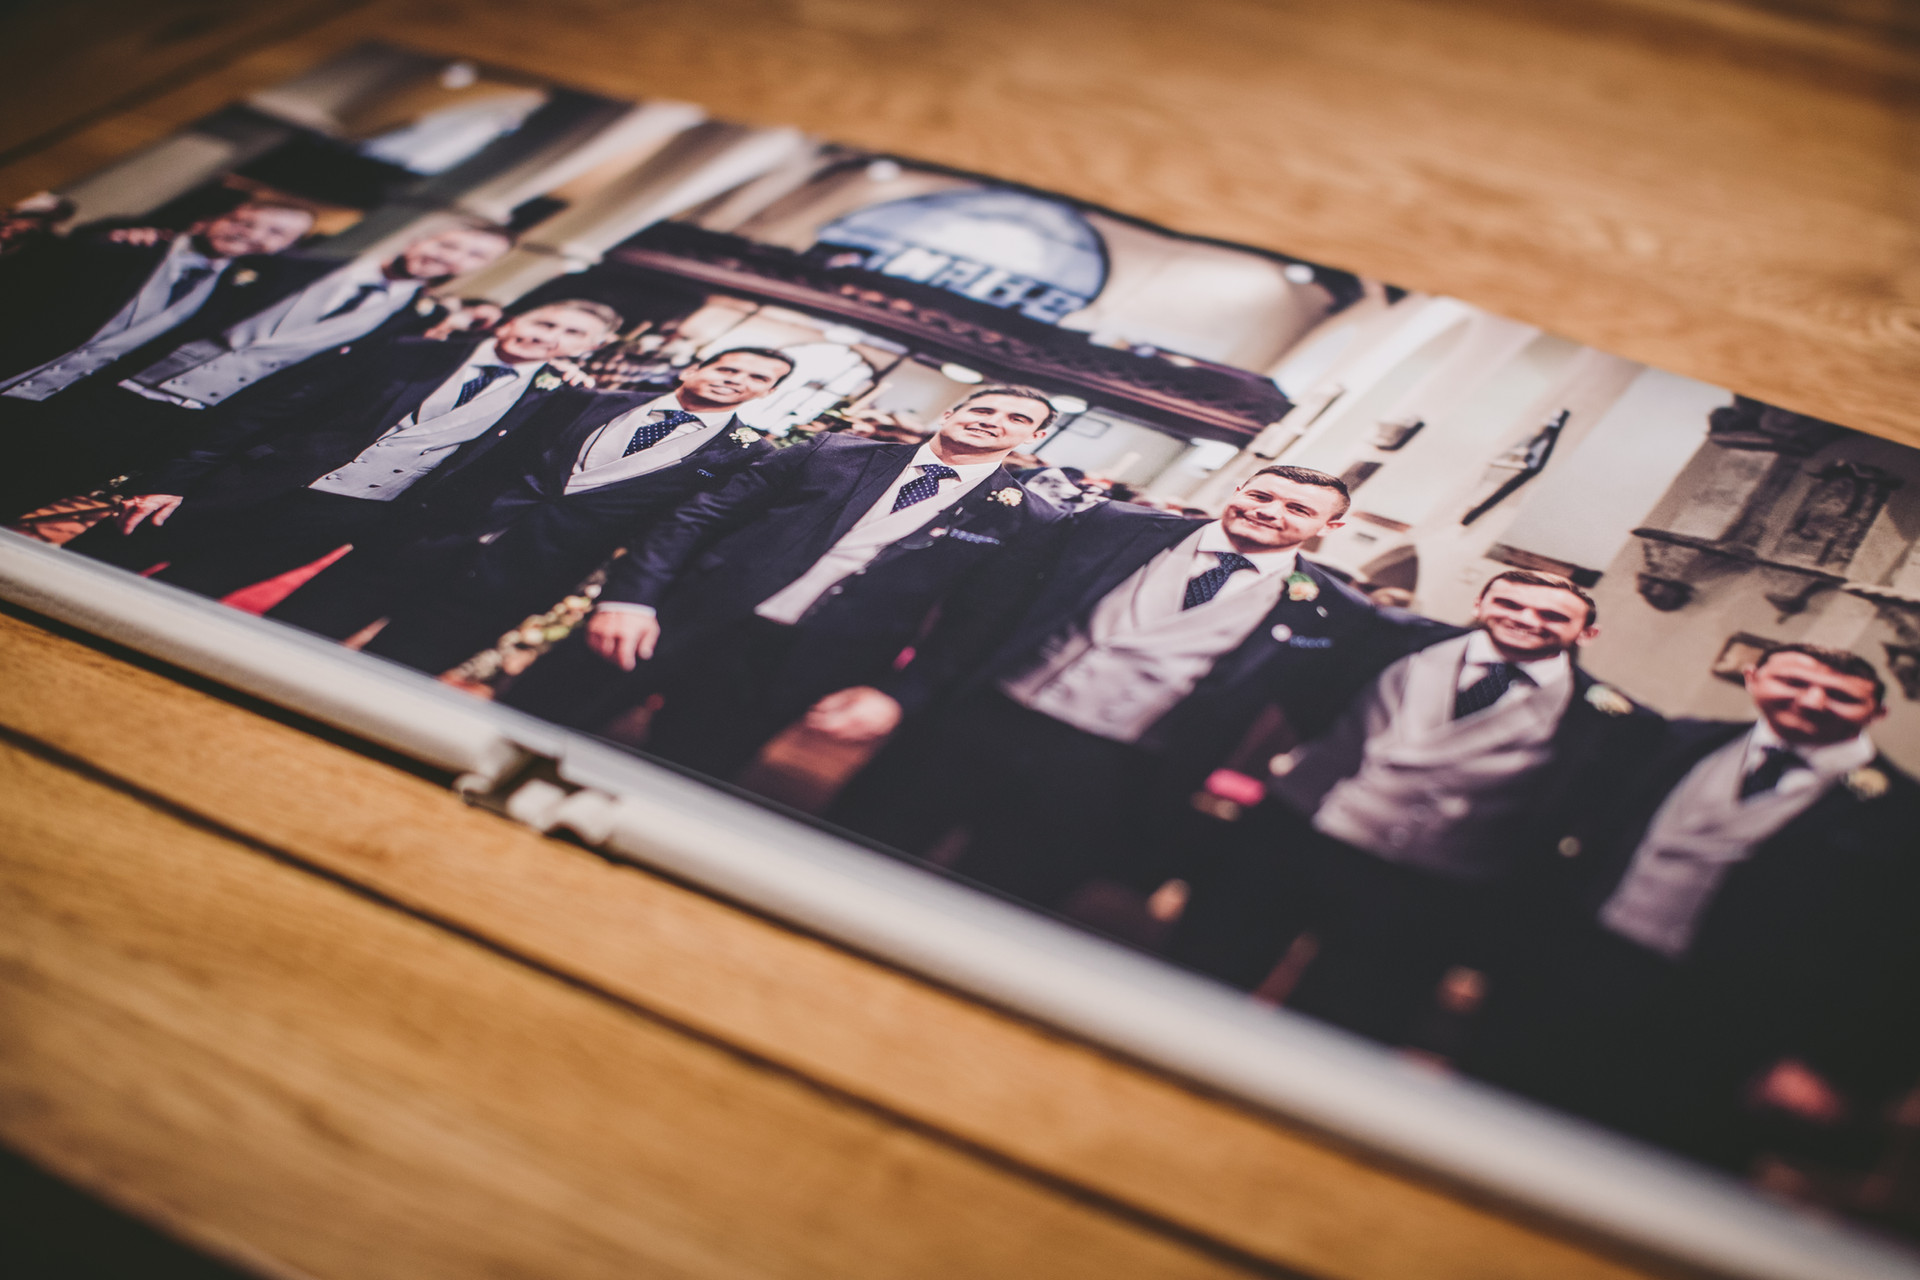 Wedding-album-15.jpg